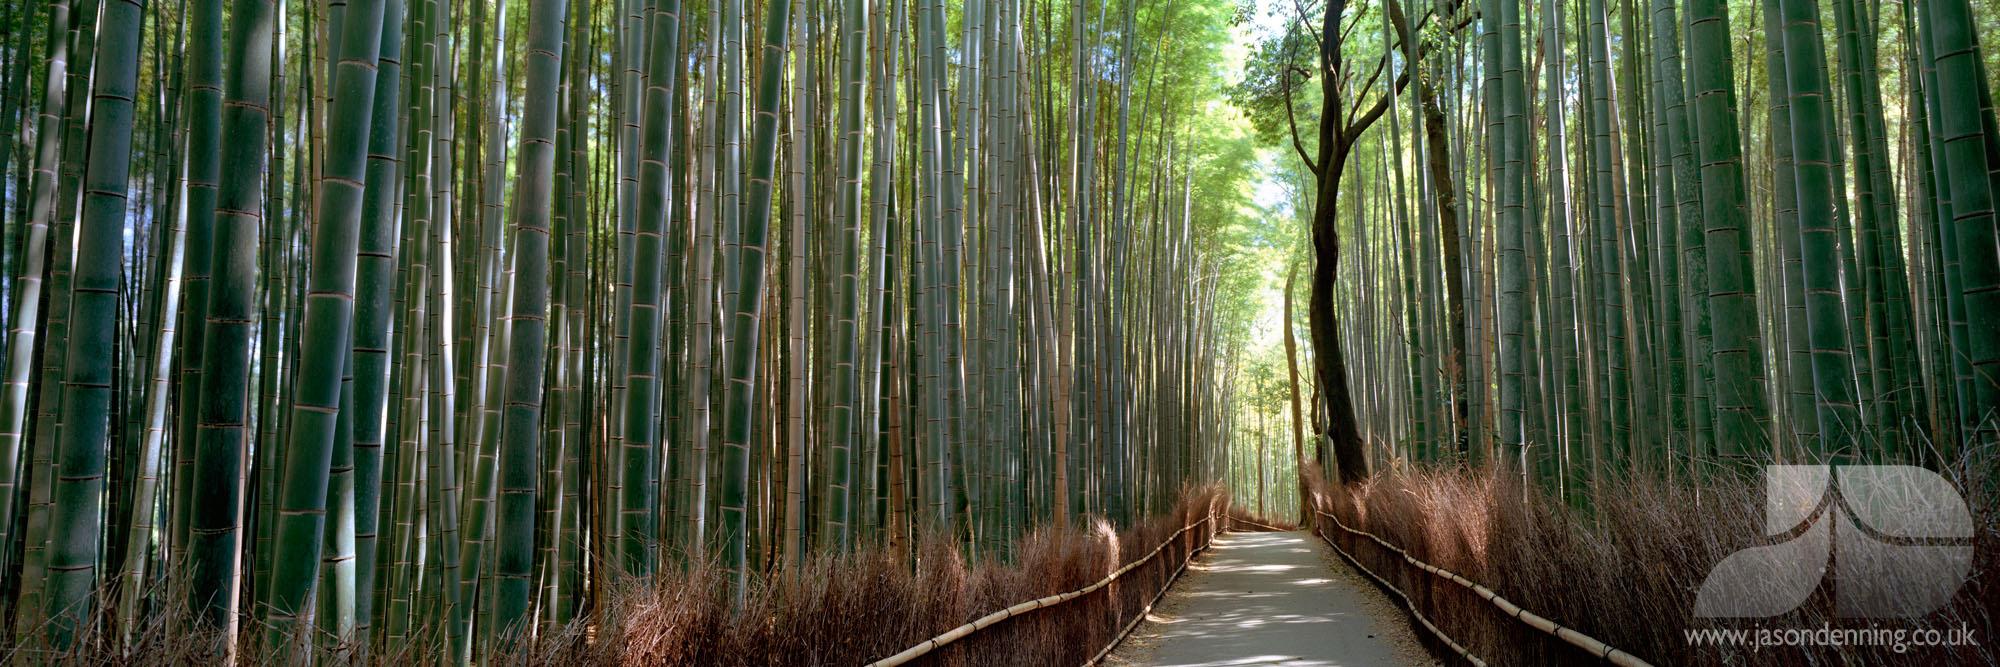 Japan Road Trip – Kyoto – Izu Peninsula – Mount Fuji – Alps – Tojinbo Coast